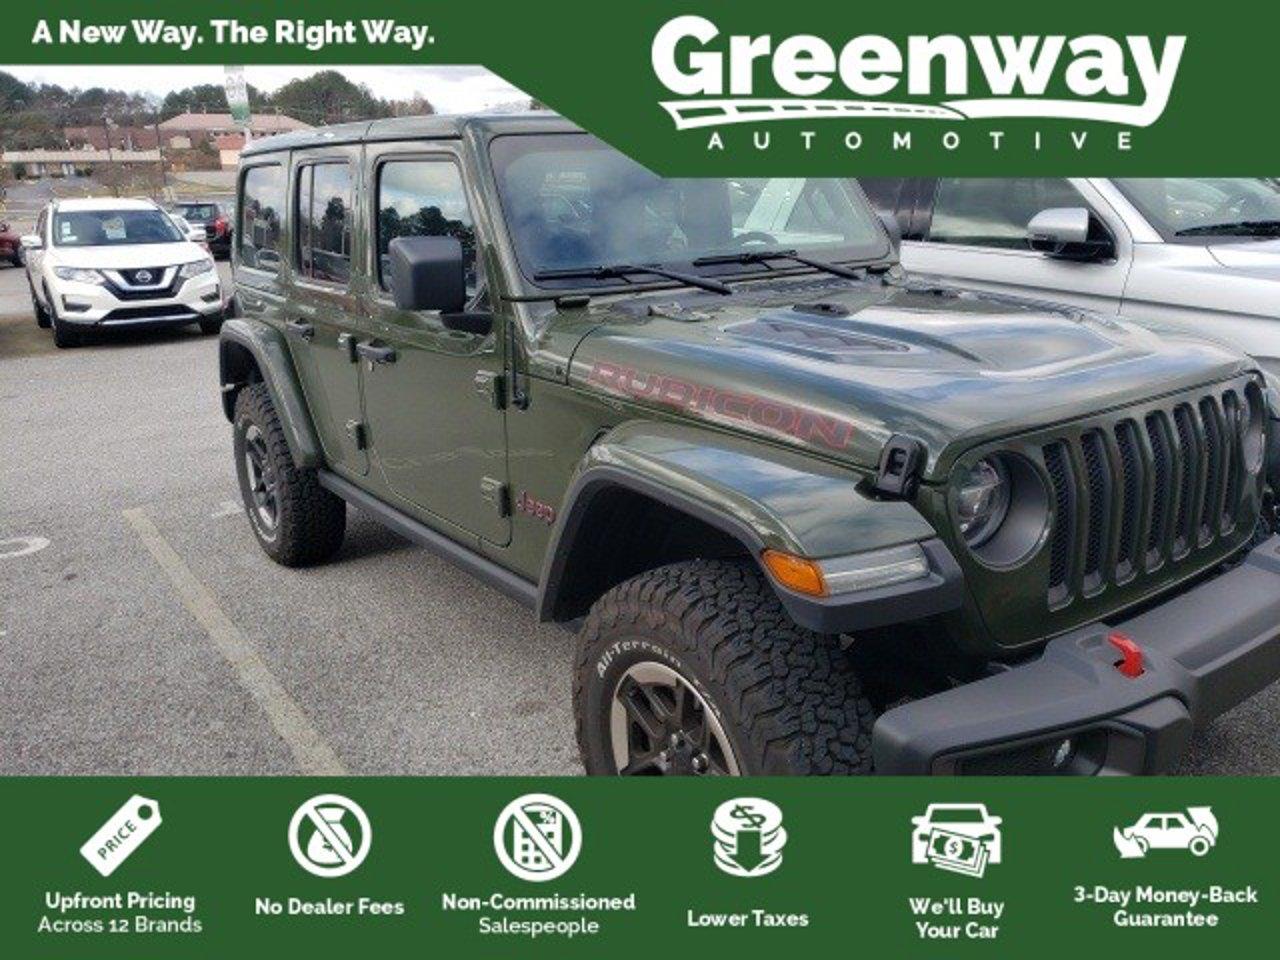 2020 Jeep Wrangler Unlimited Rubicon 1c4hjxfg8lw334968 Greenway Automotive Orlando Fl